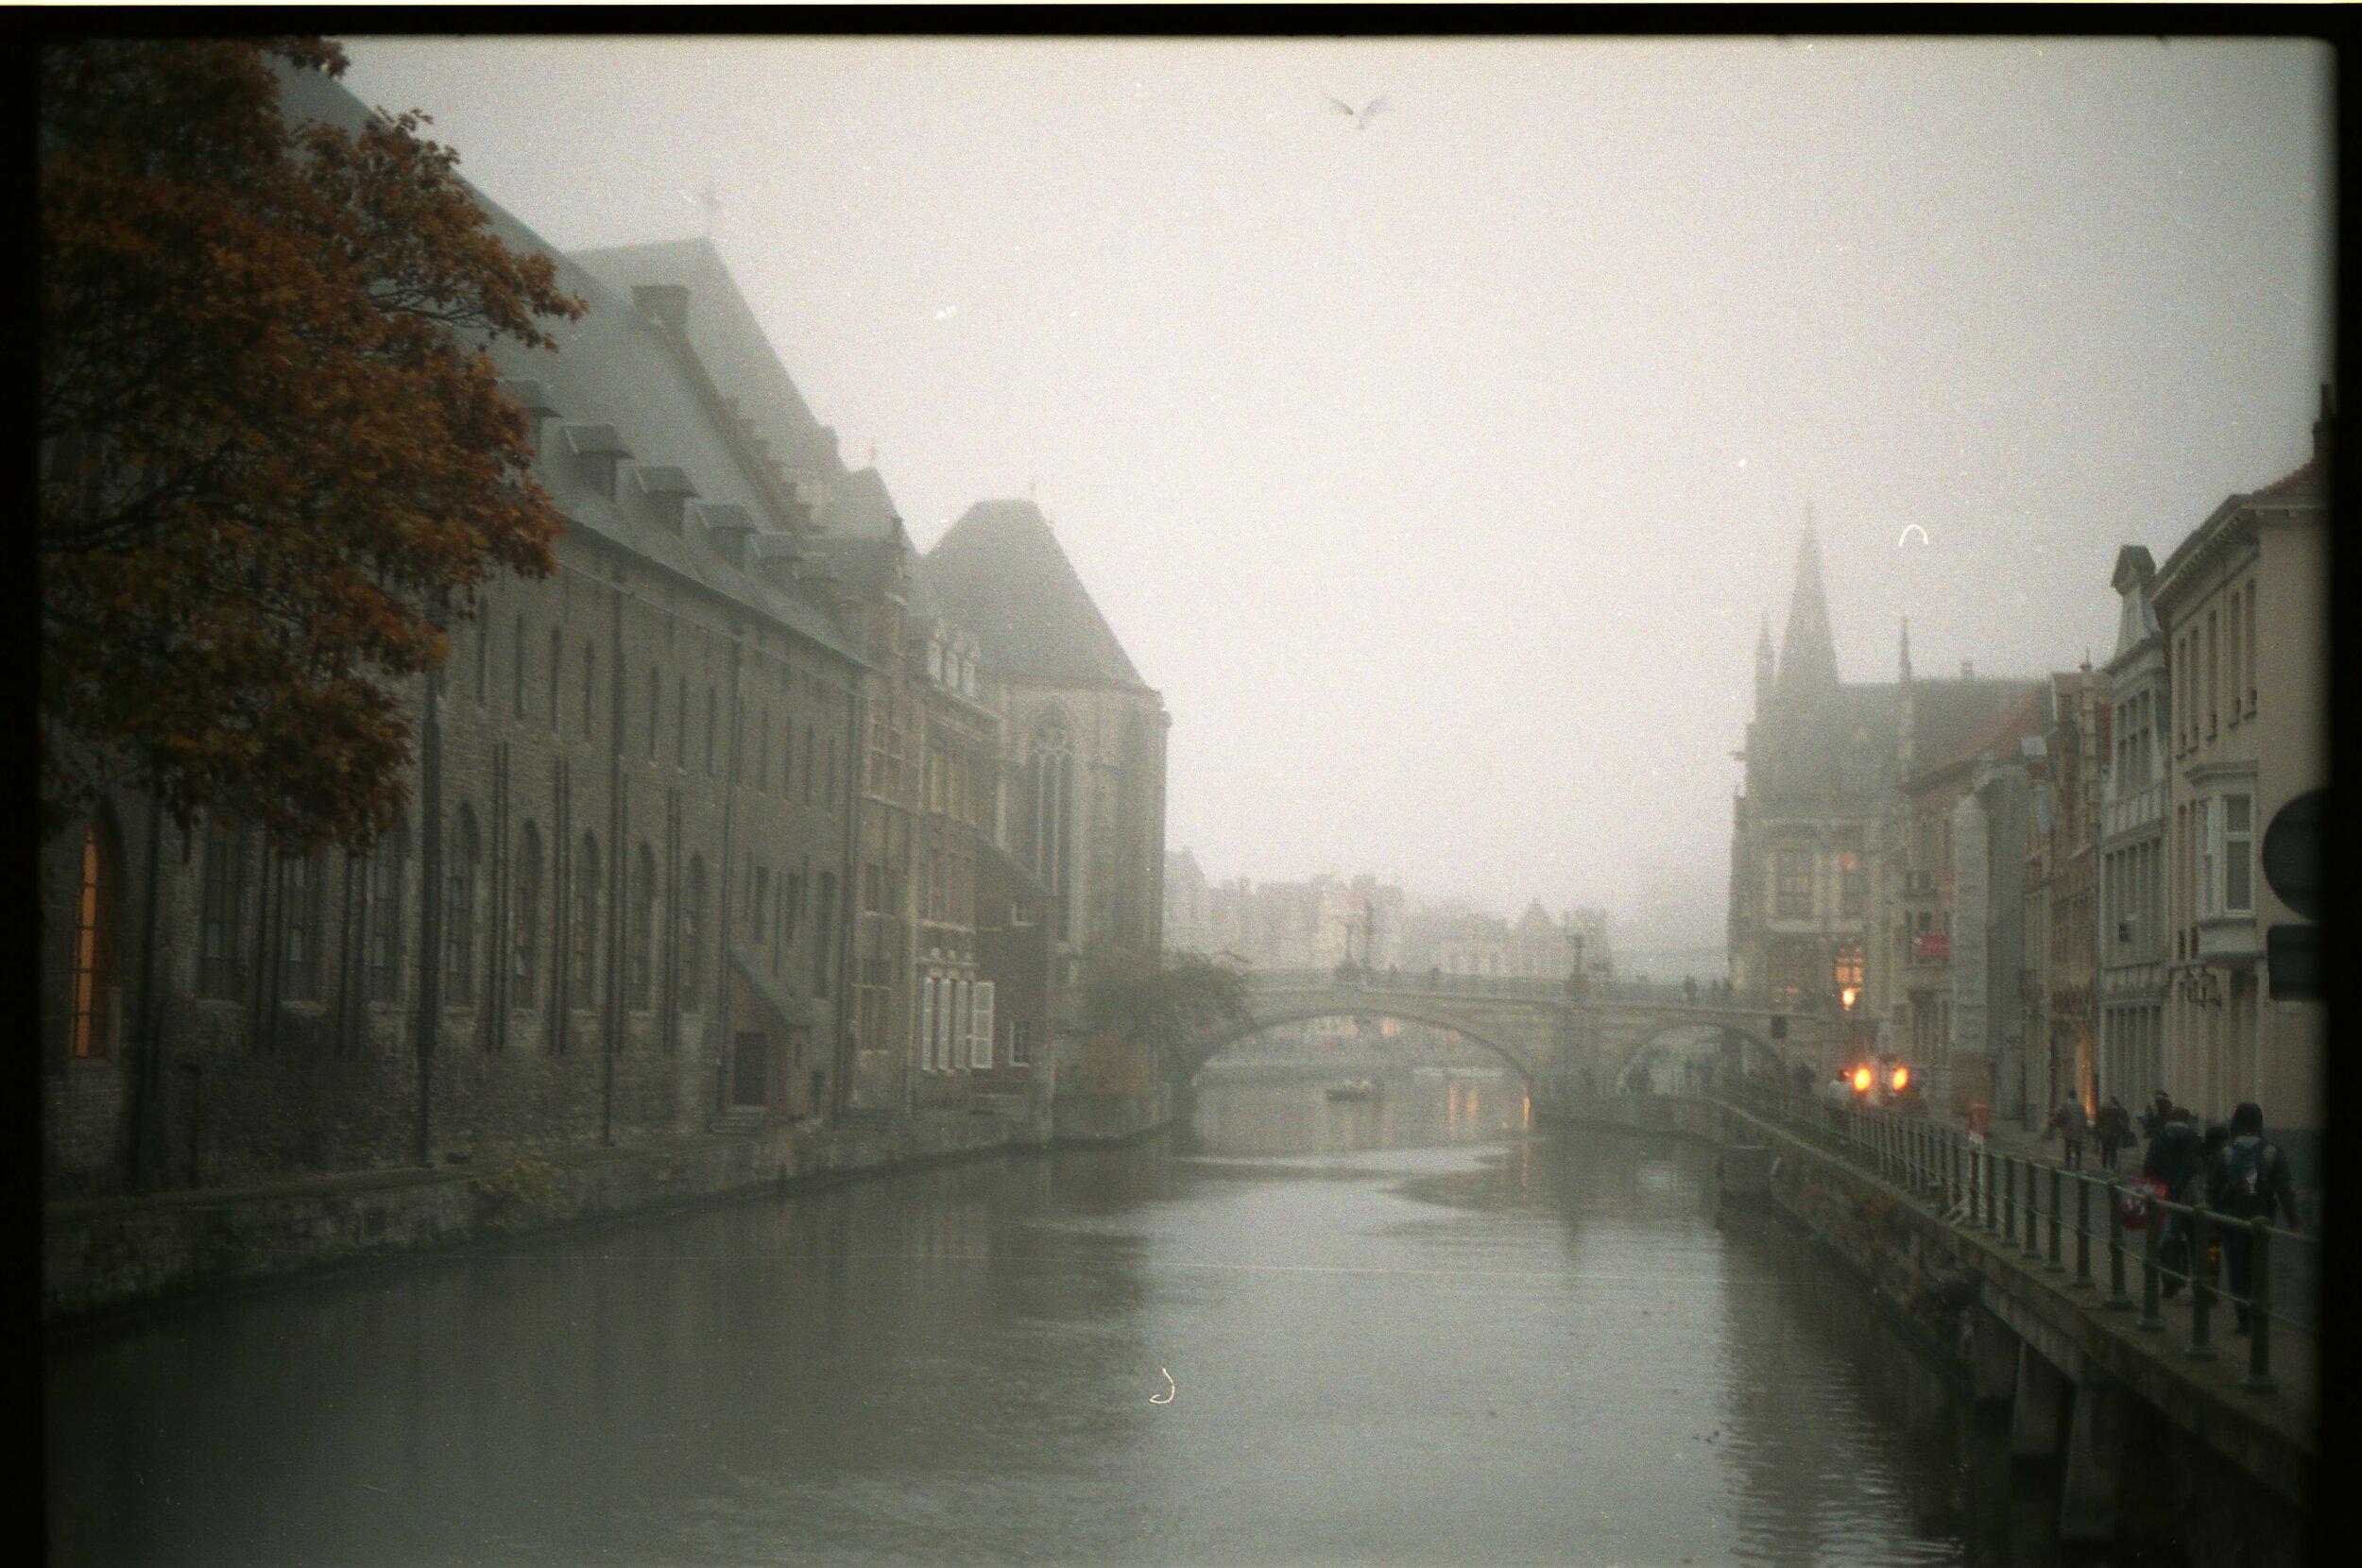 Ghent 35mm021.jpg